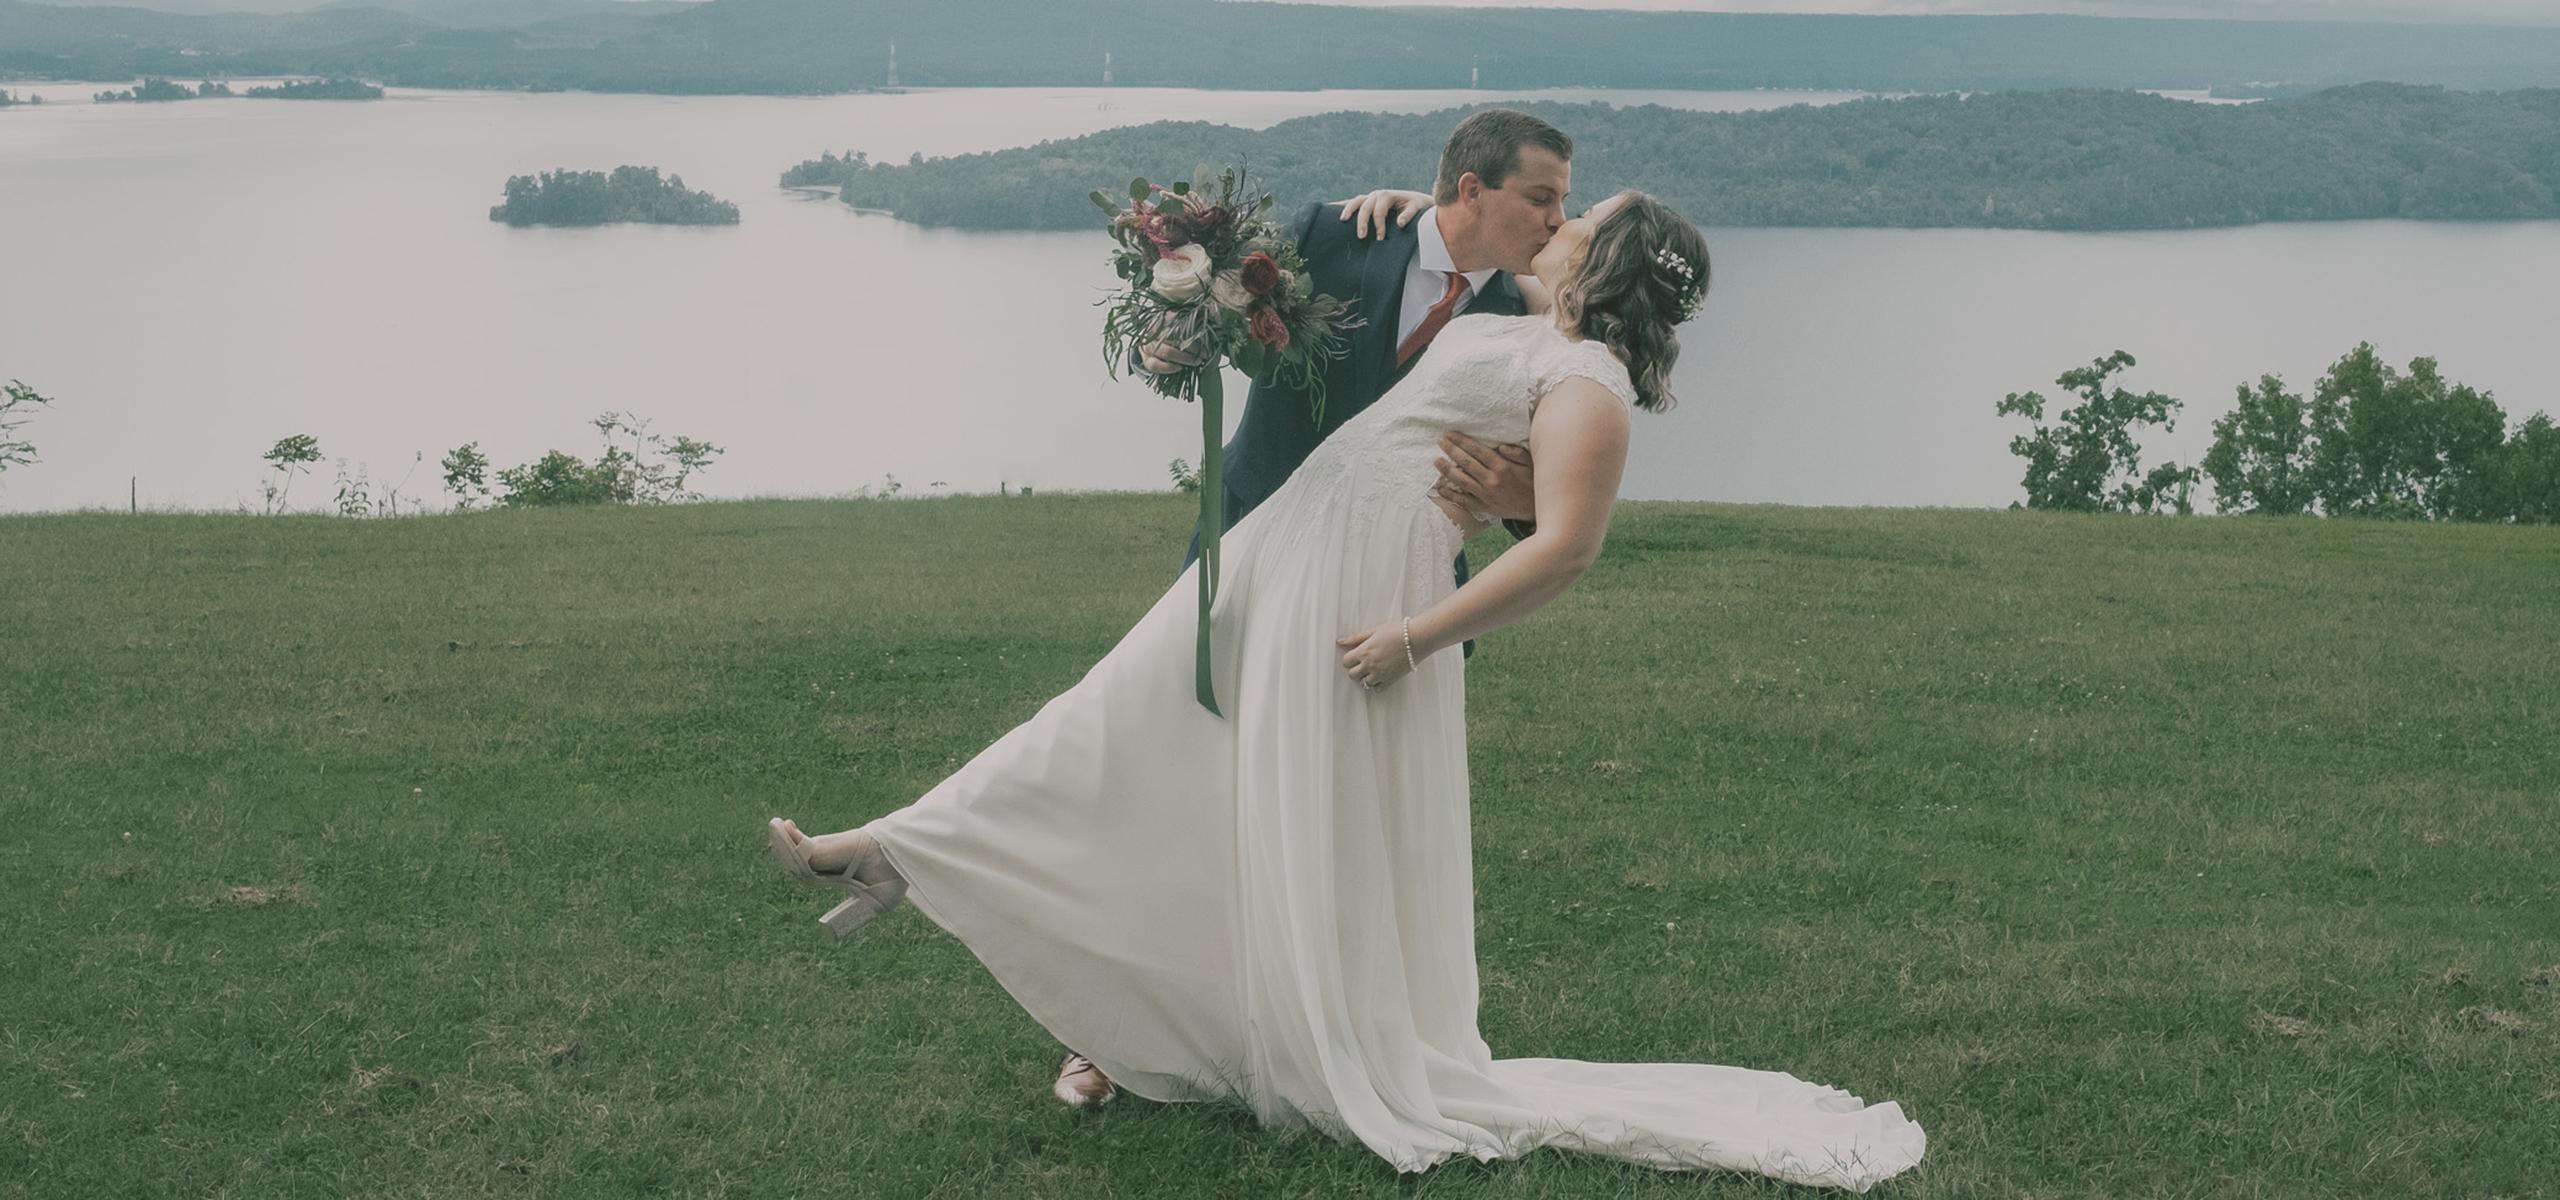 Bellevue Washington Wedding Photography + Elopement Photography